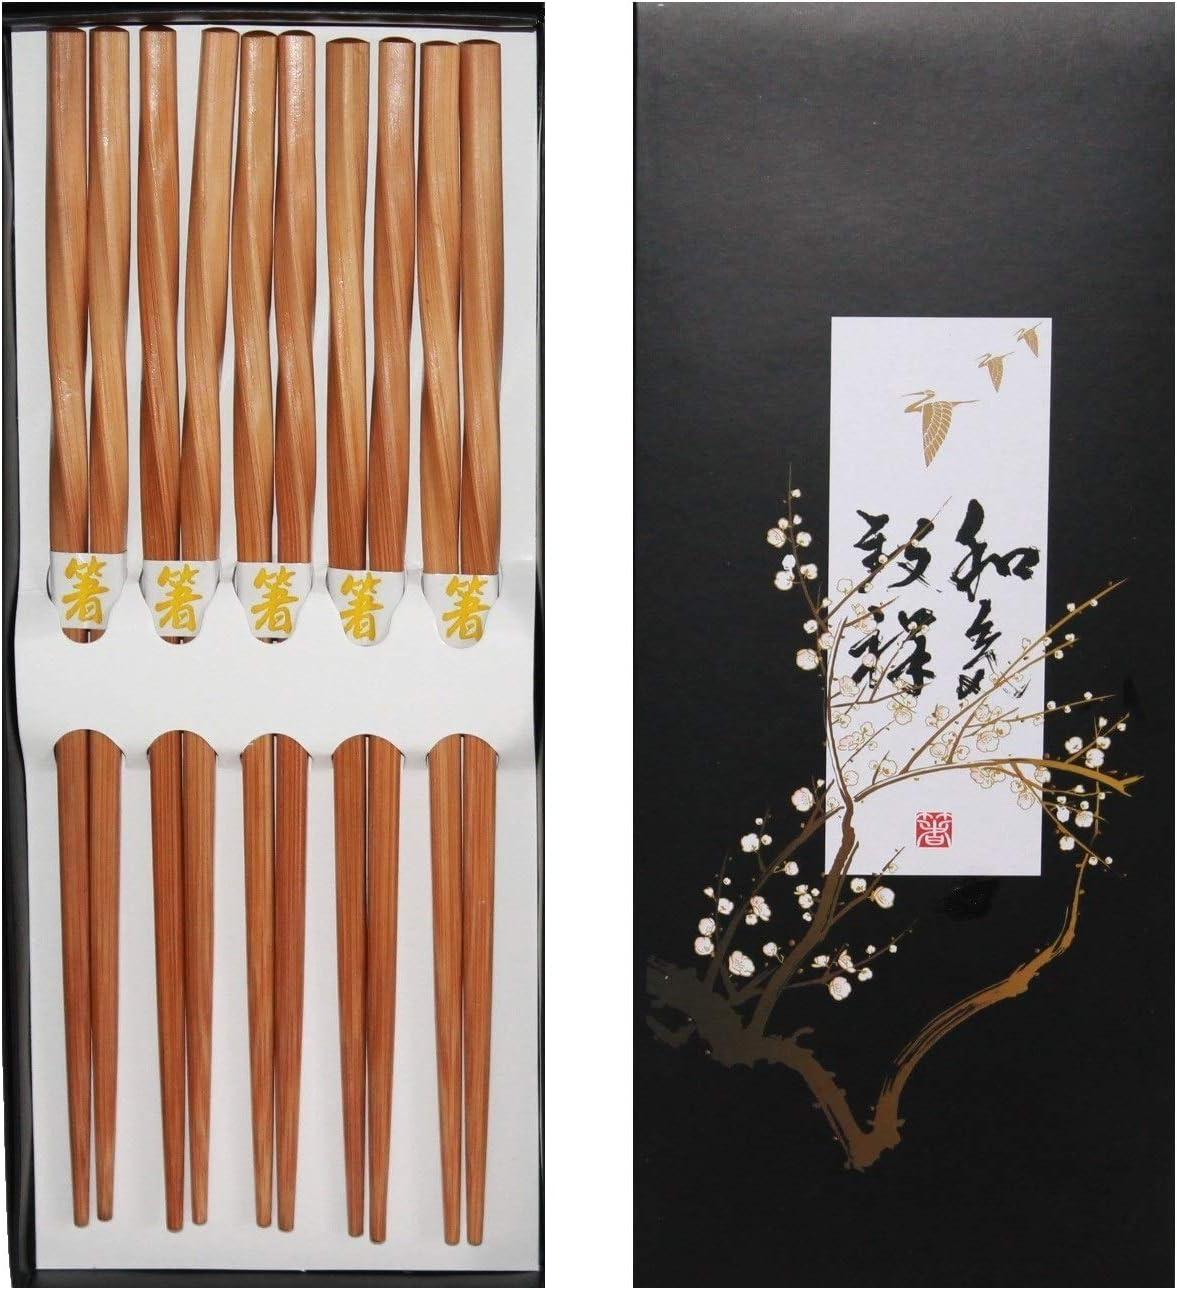 070 Chopsticks 5 Paar Stäbchen Eßstäbchen Bambus Holz twisted gedreht